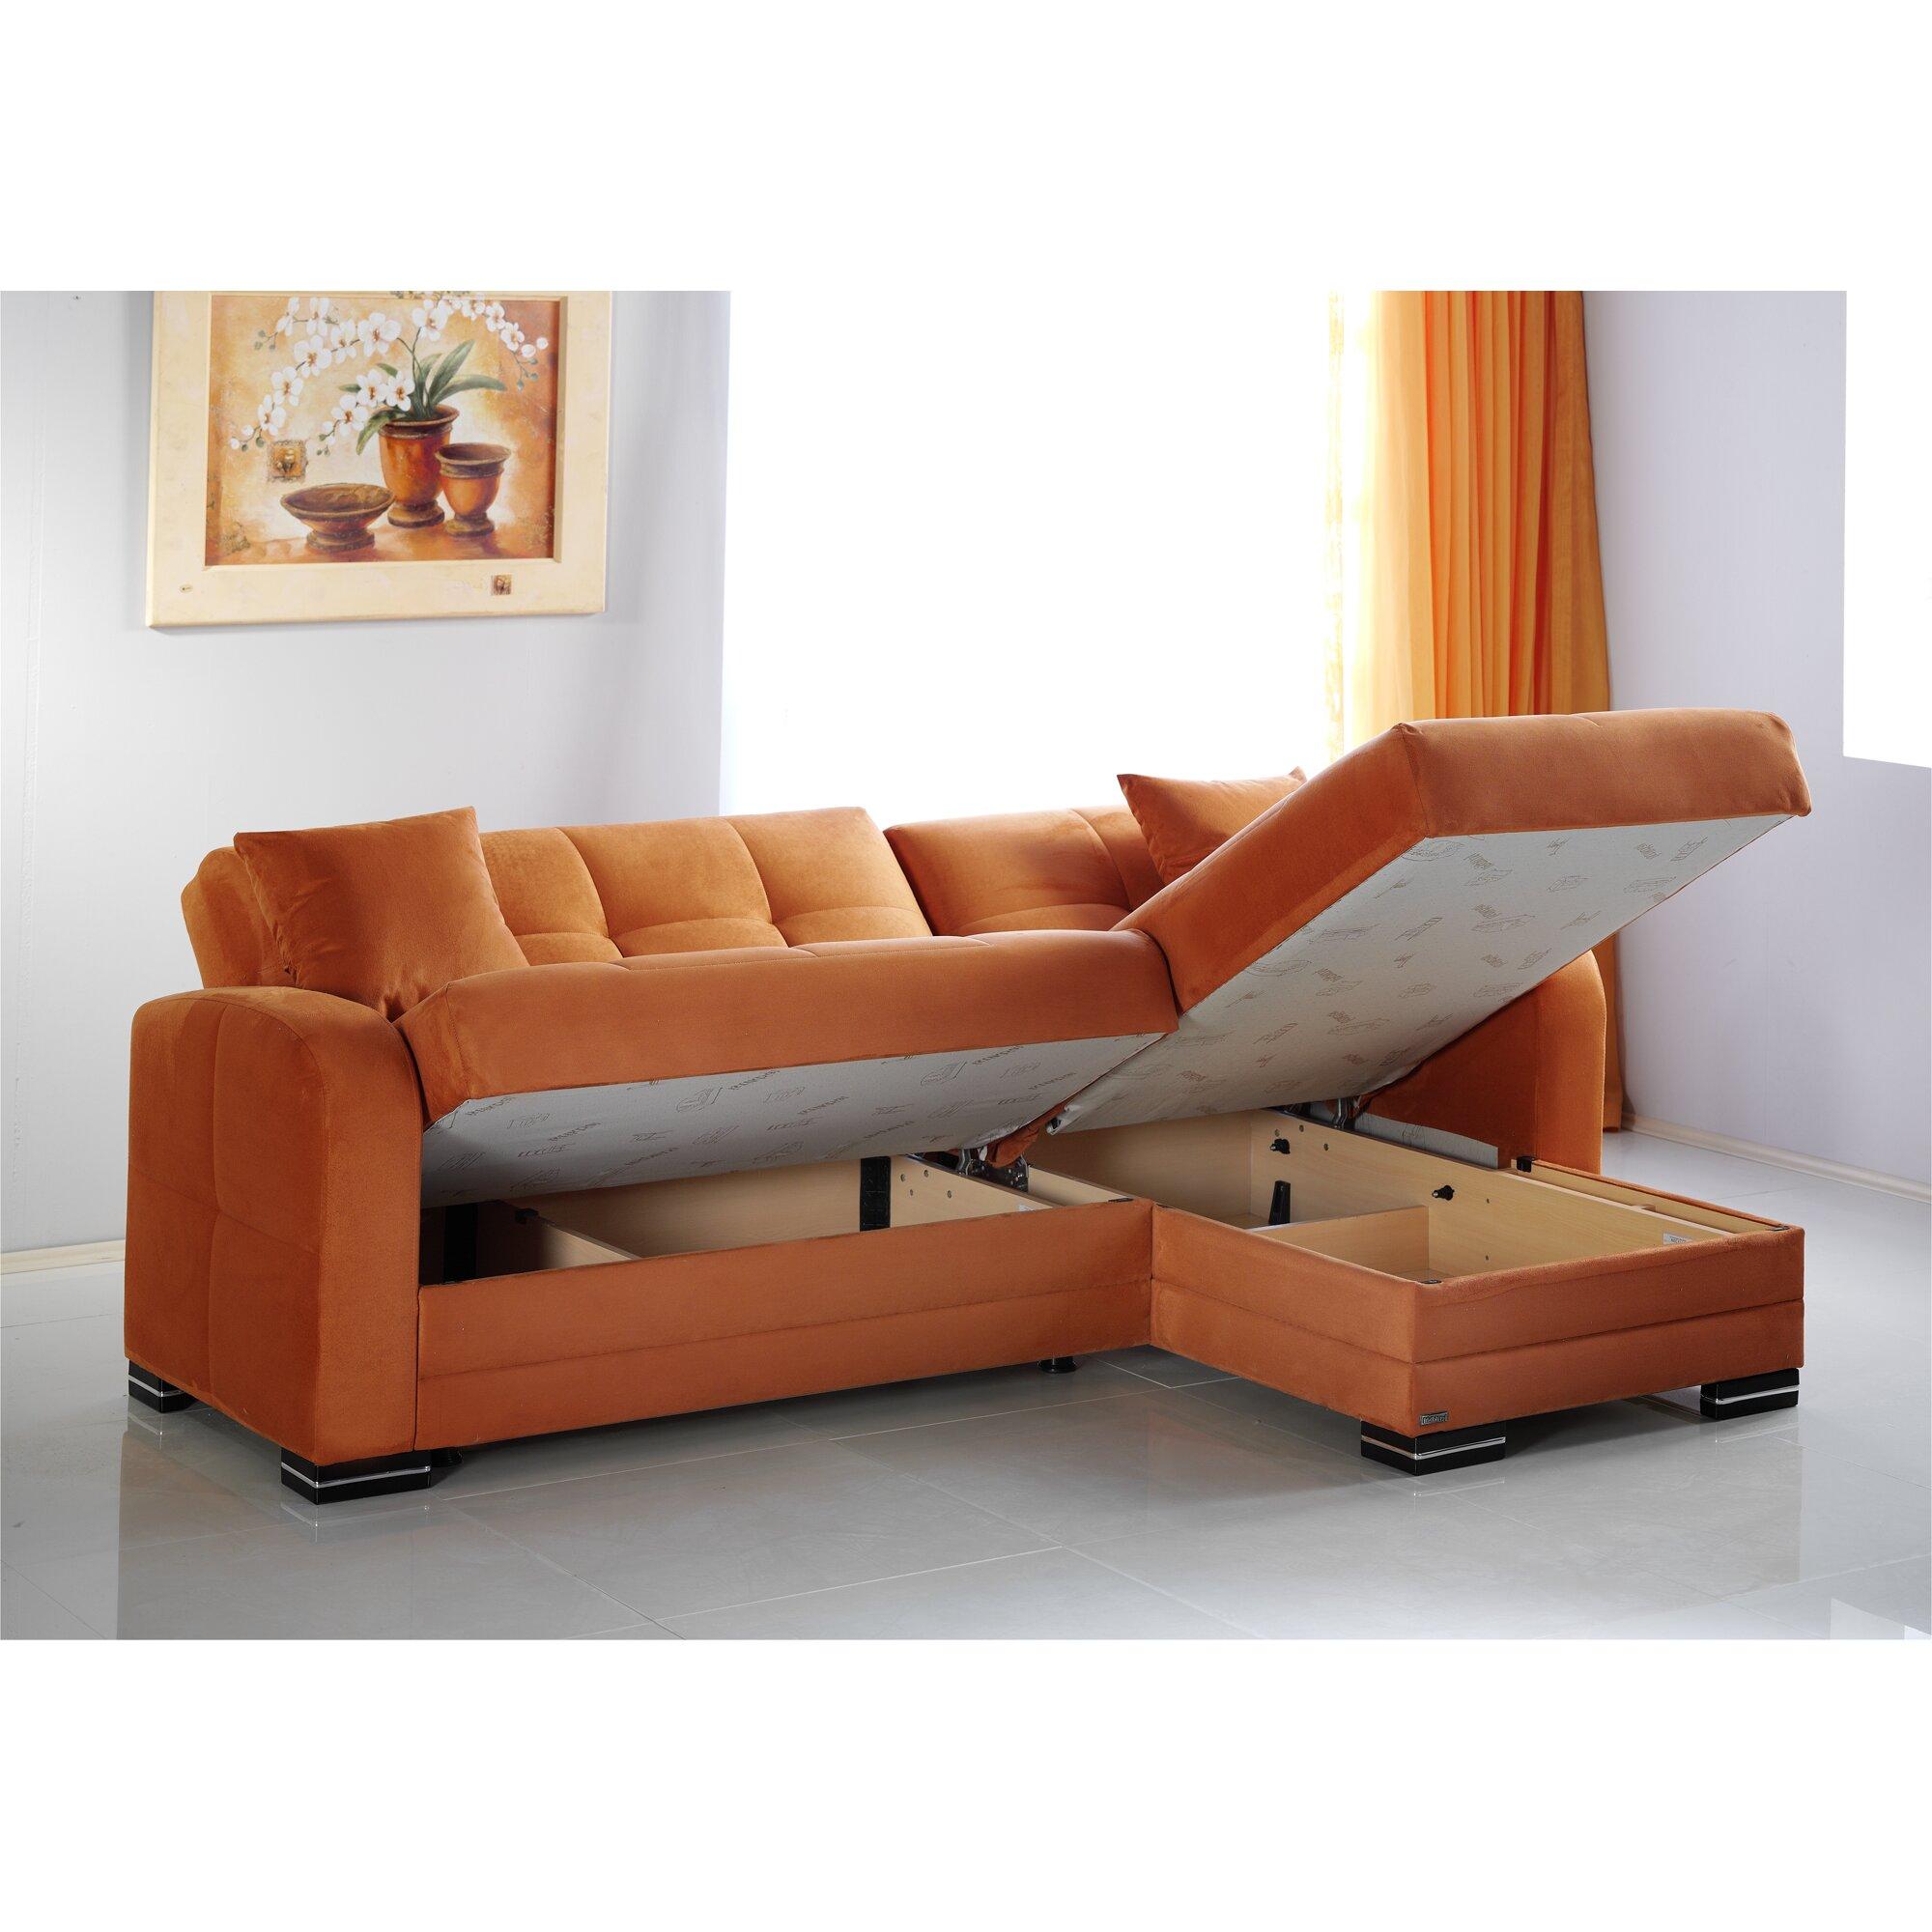 Kubo Corner Chaise Sofa Bed Refil Sofa